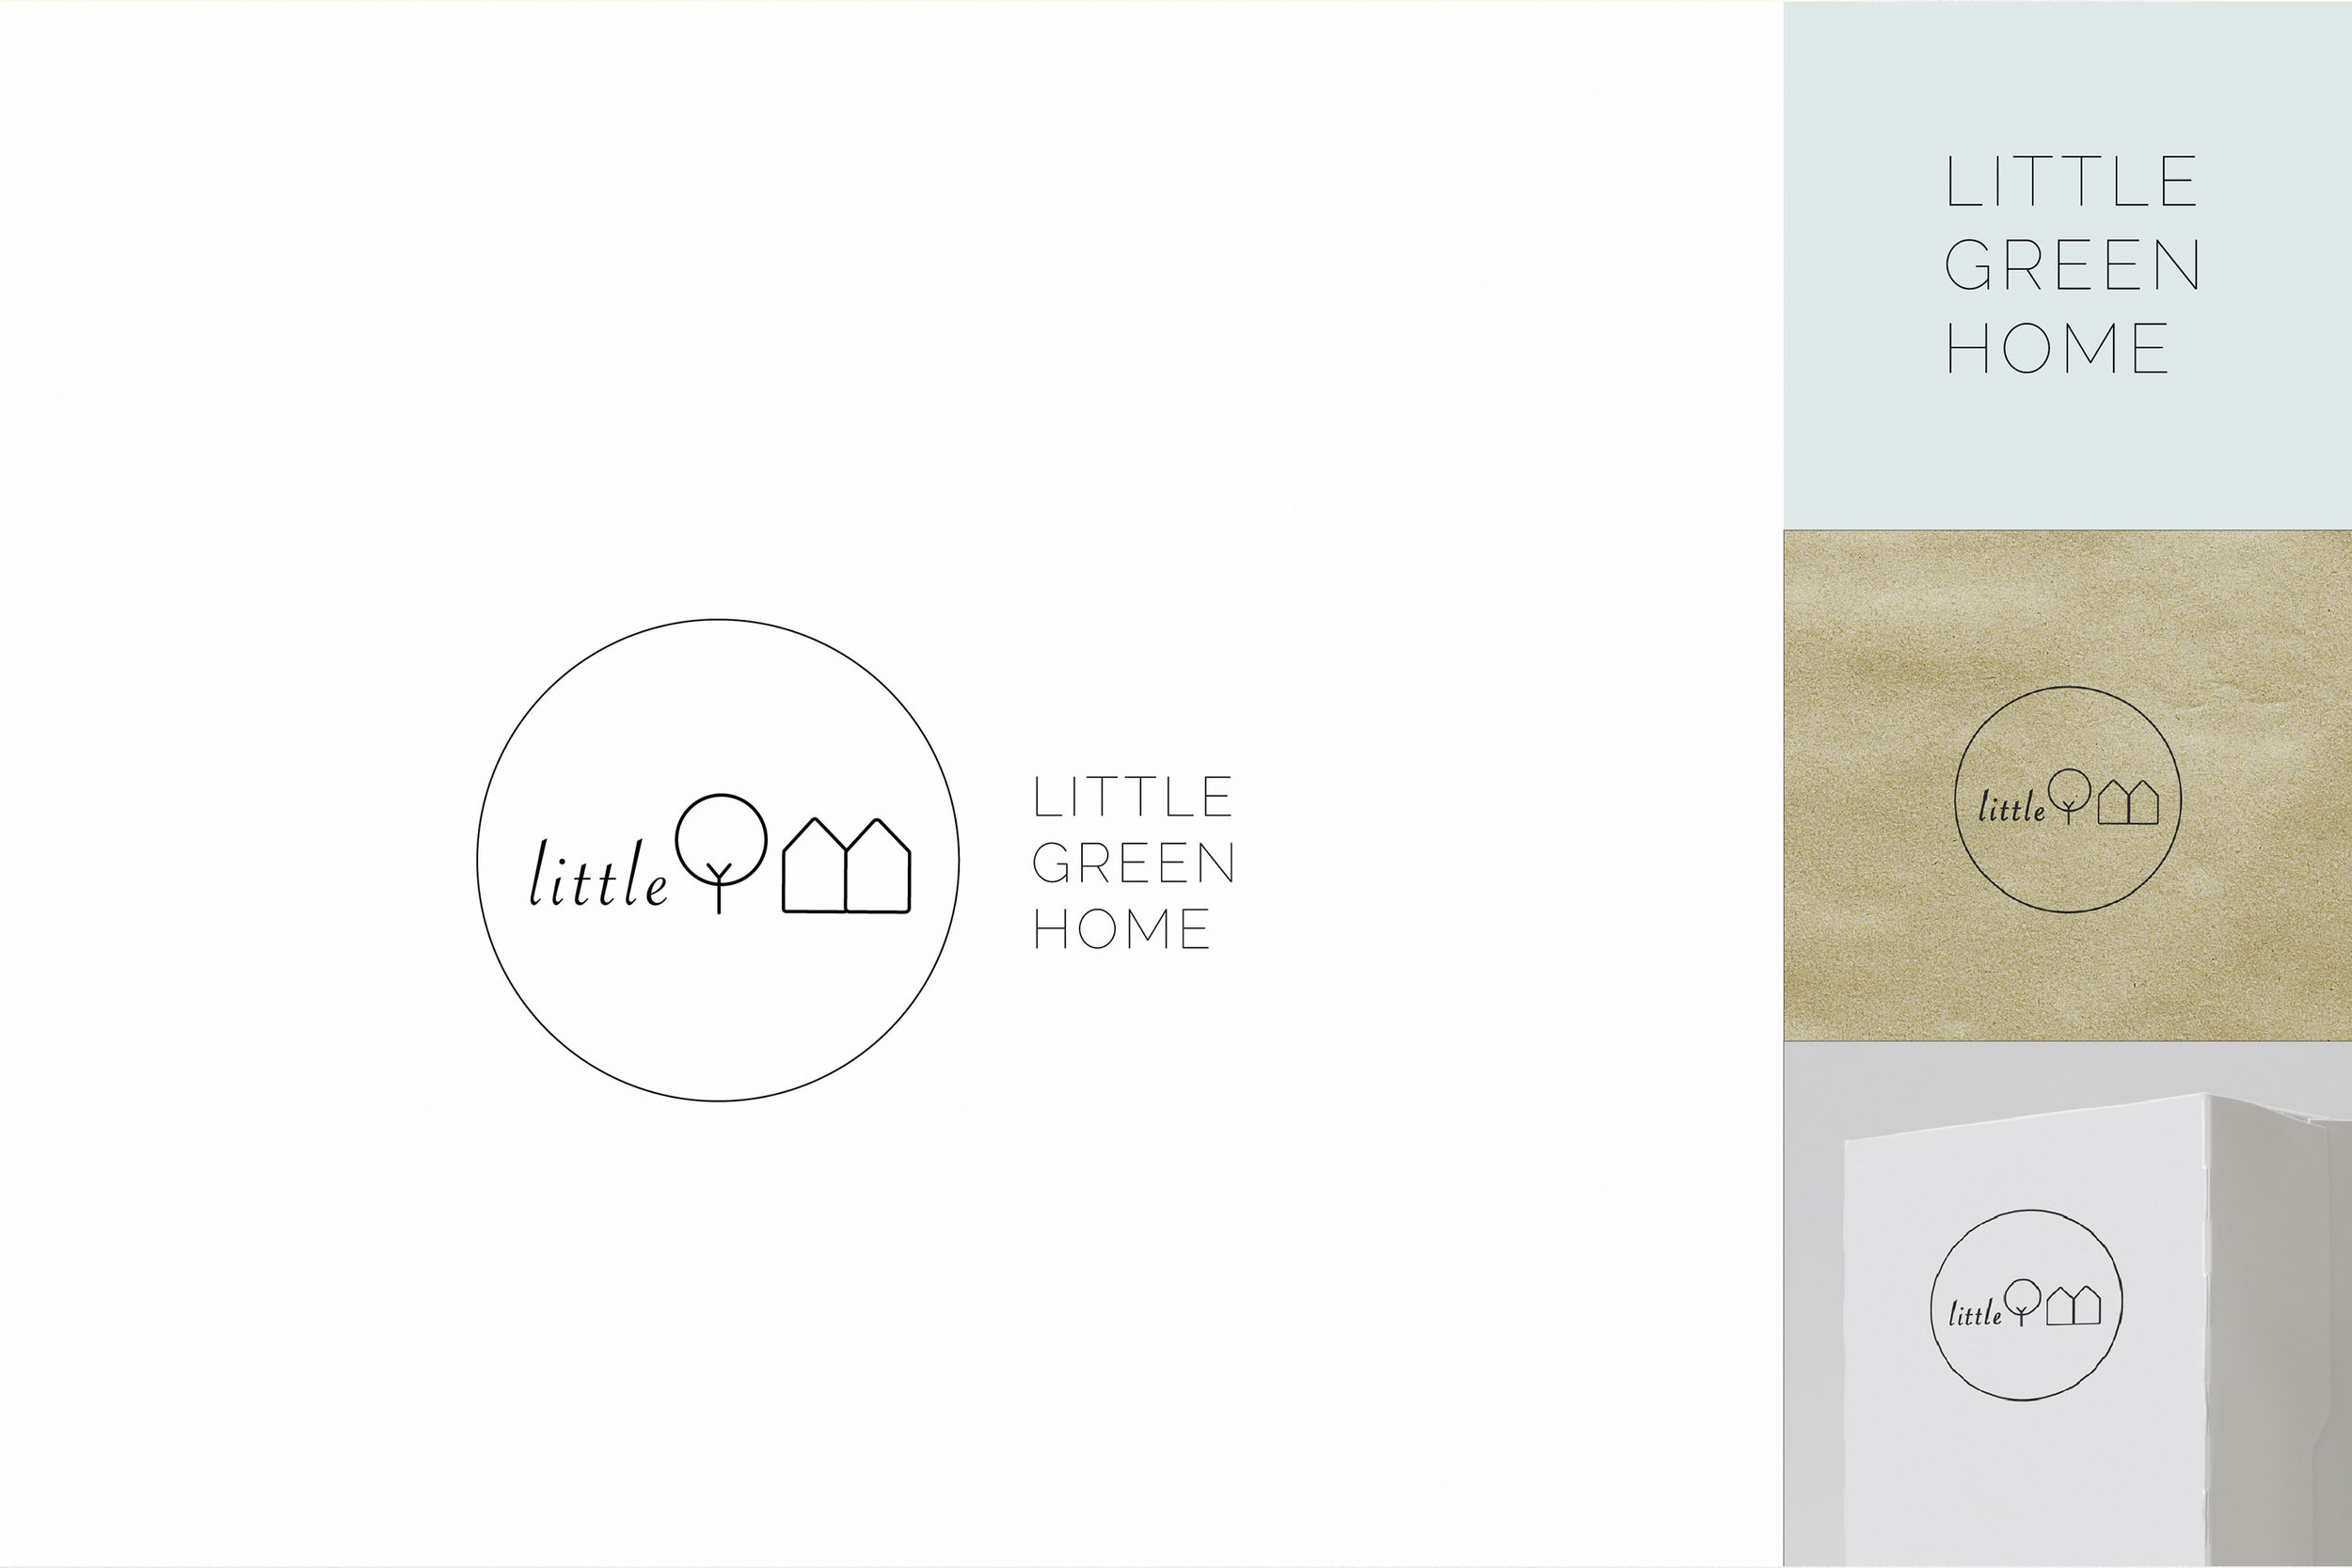 Little_Green_Home_CORPORATE_Identity.jpg